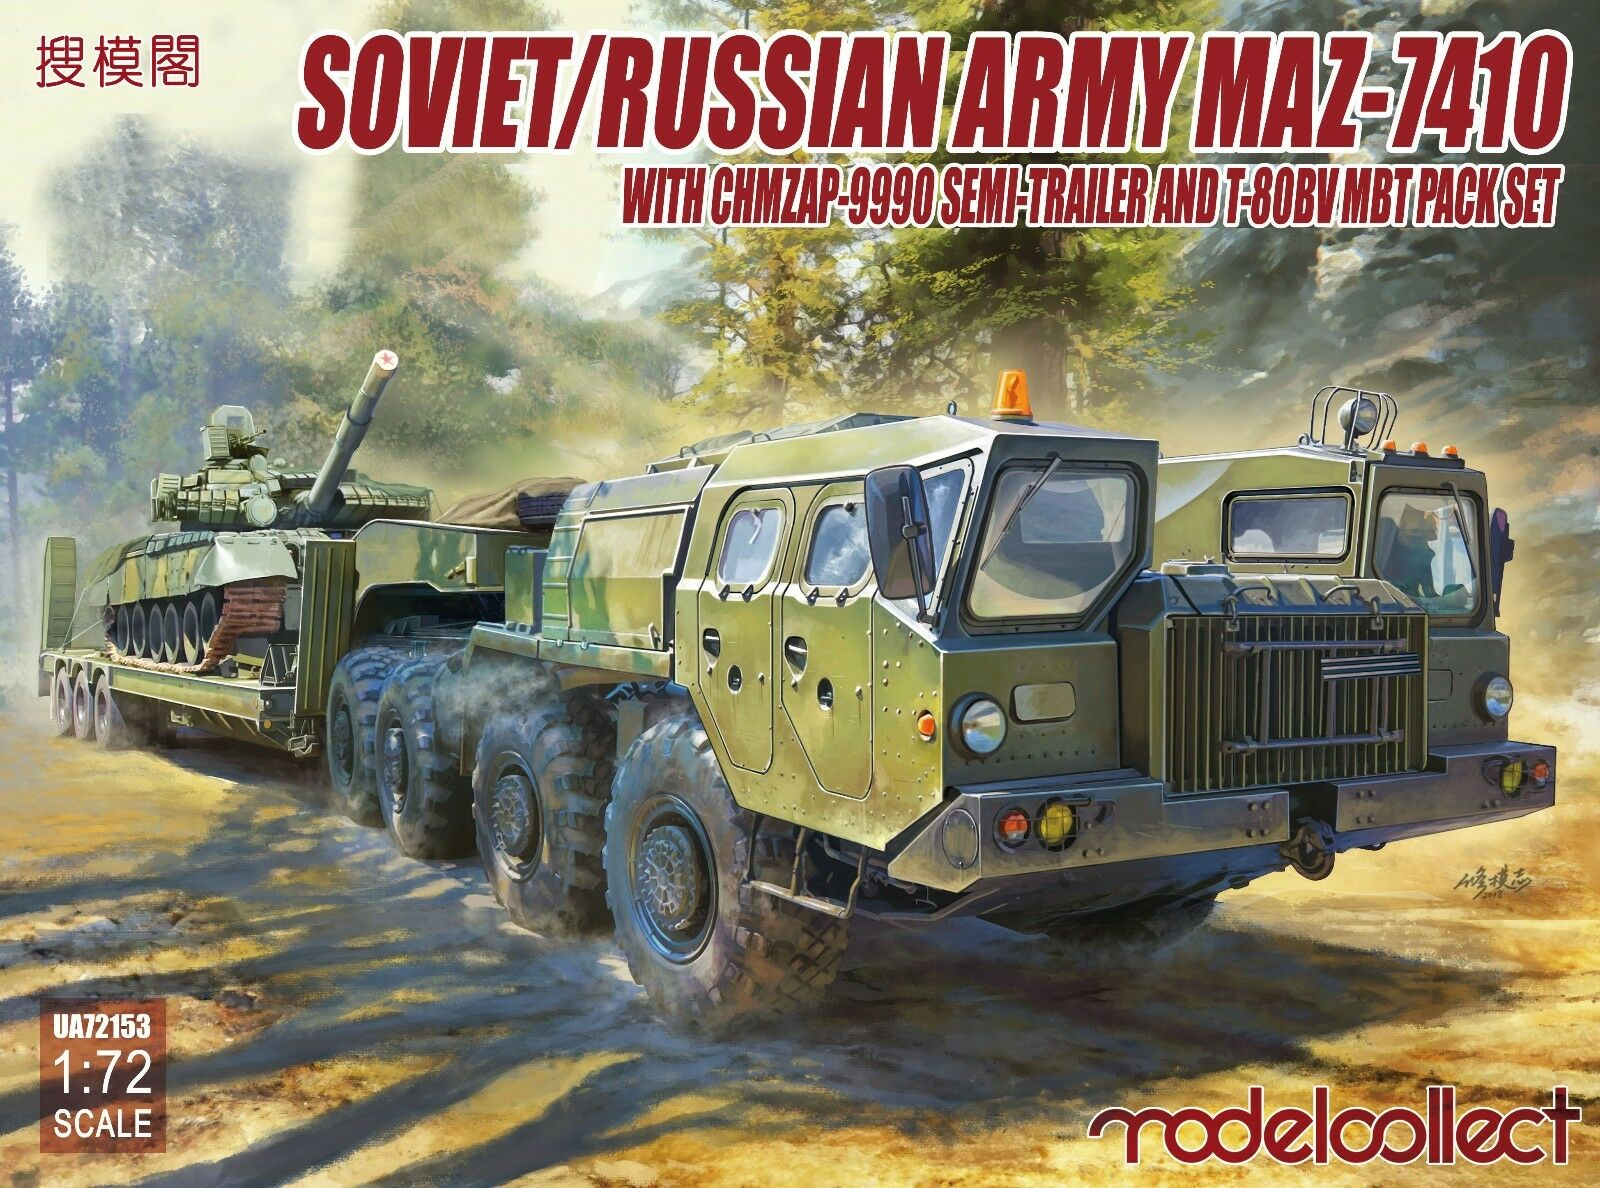 Modelcollect UA72153 SOVIET RUSSIAN ARMY MAZ-7410 1 72